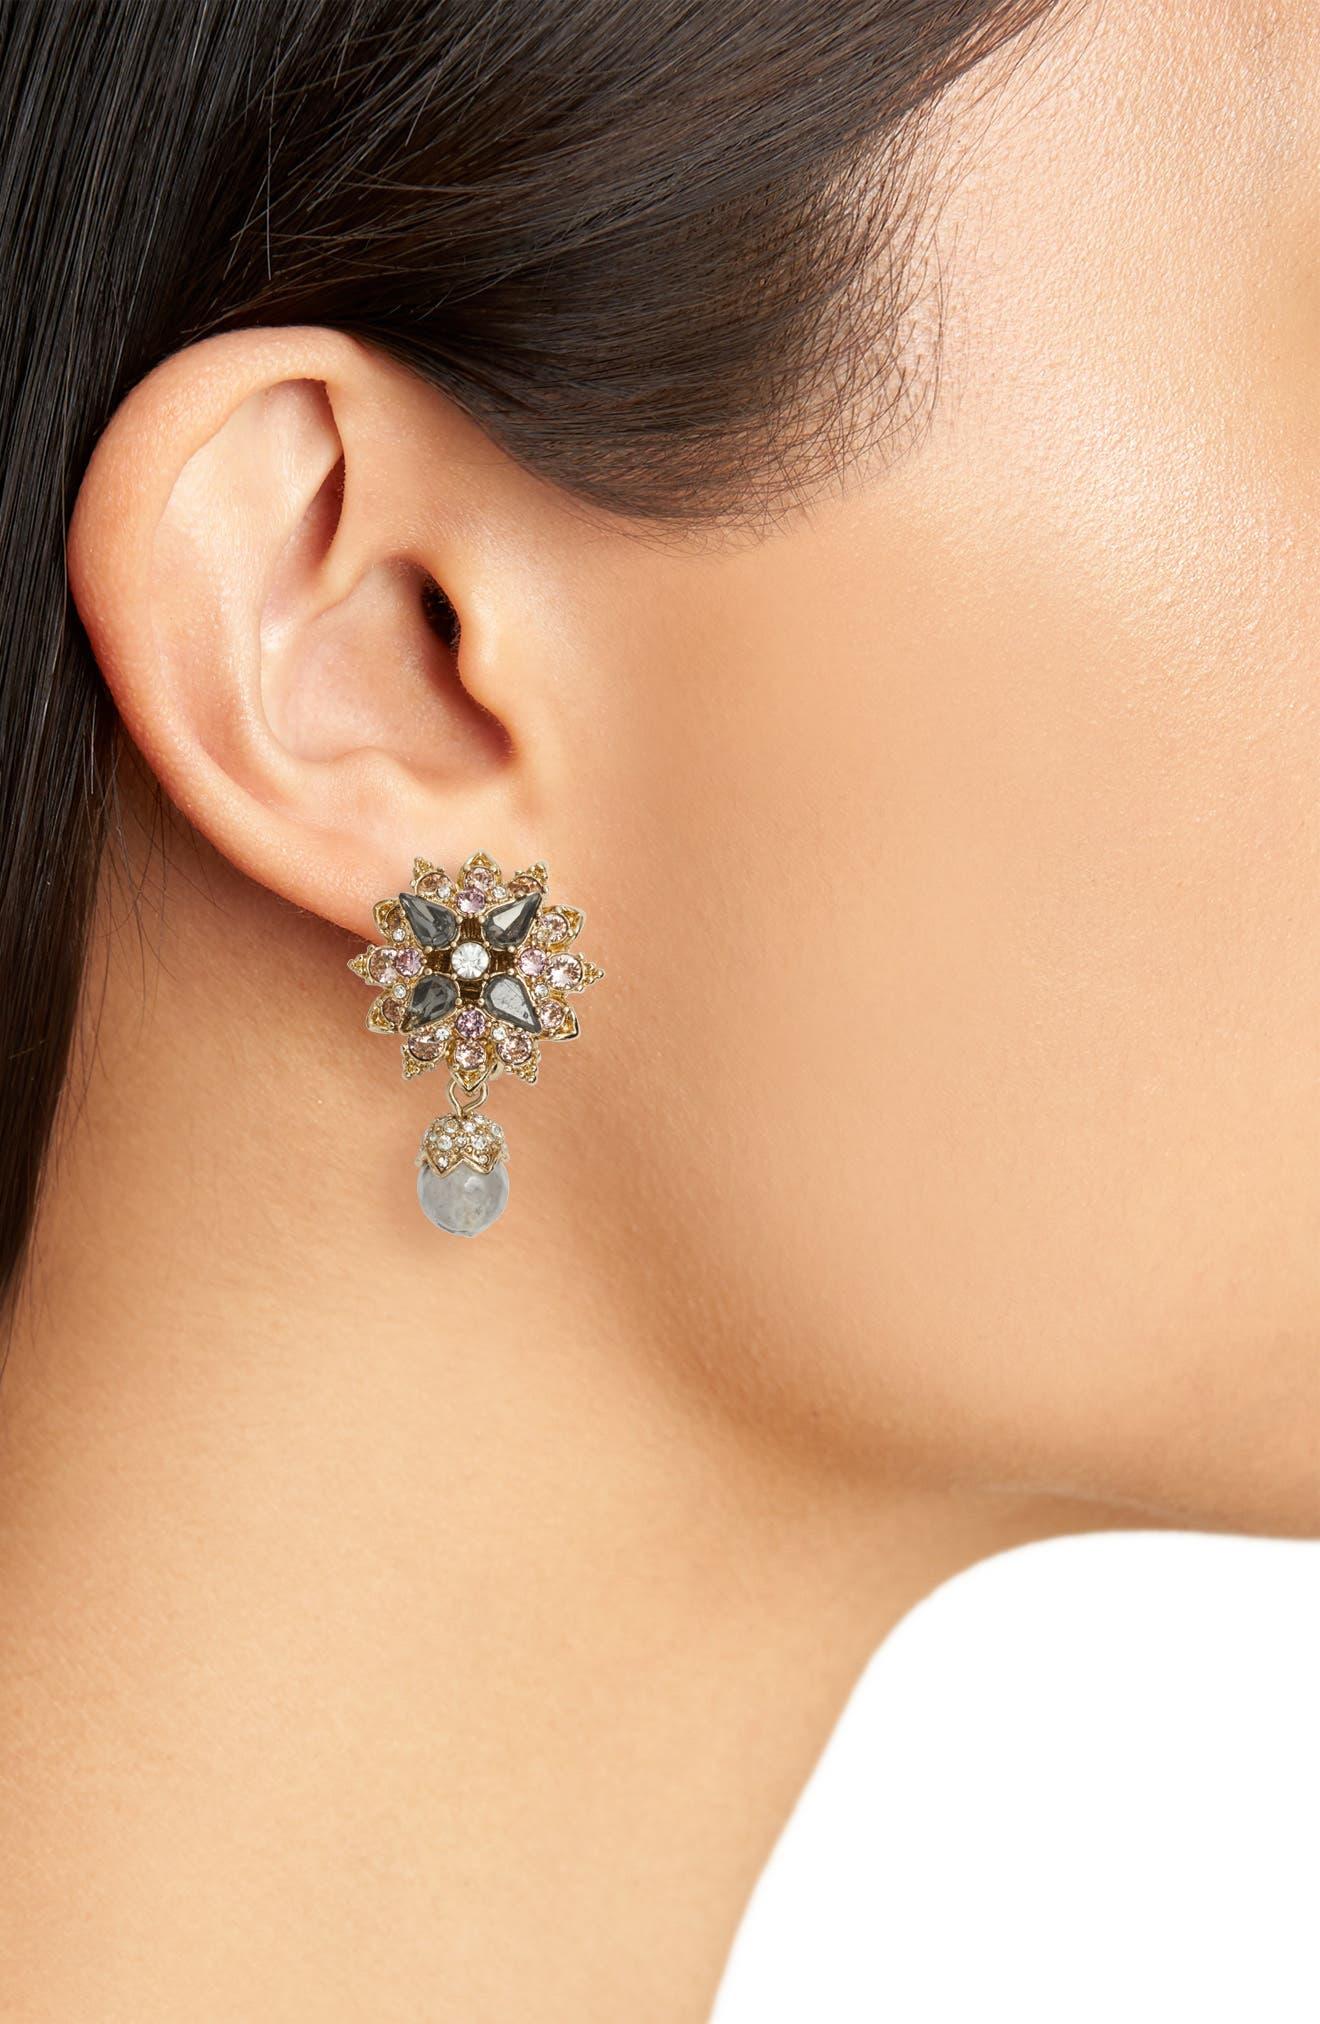 Crystal Drop Earrings,                             Alternate thumbnail 2, color,                             Gold/ Grey Multi